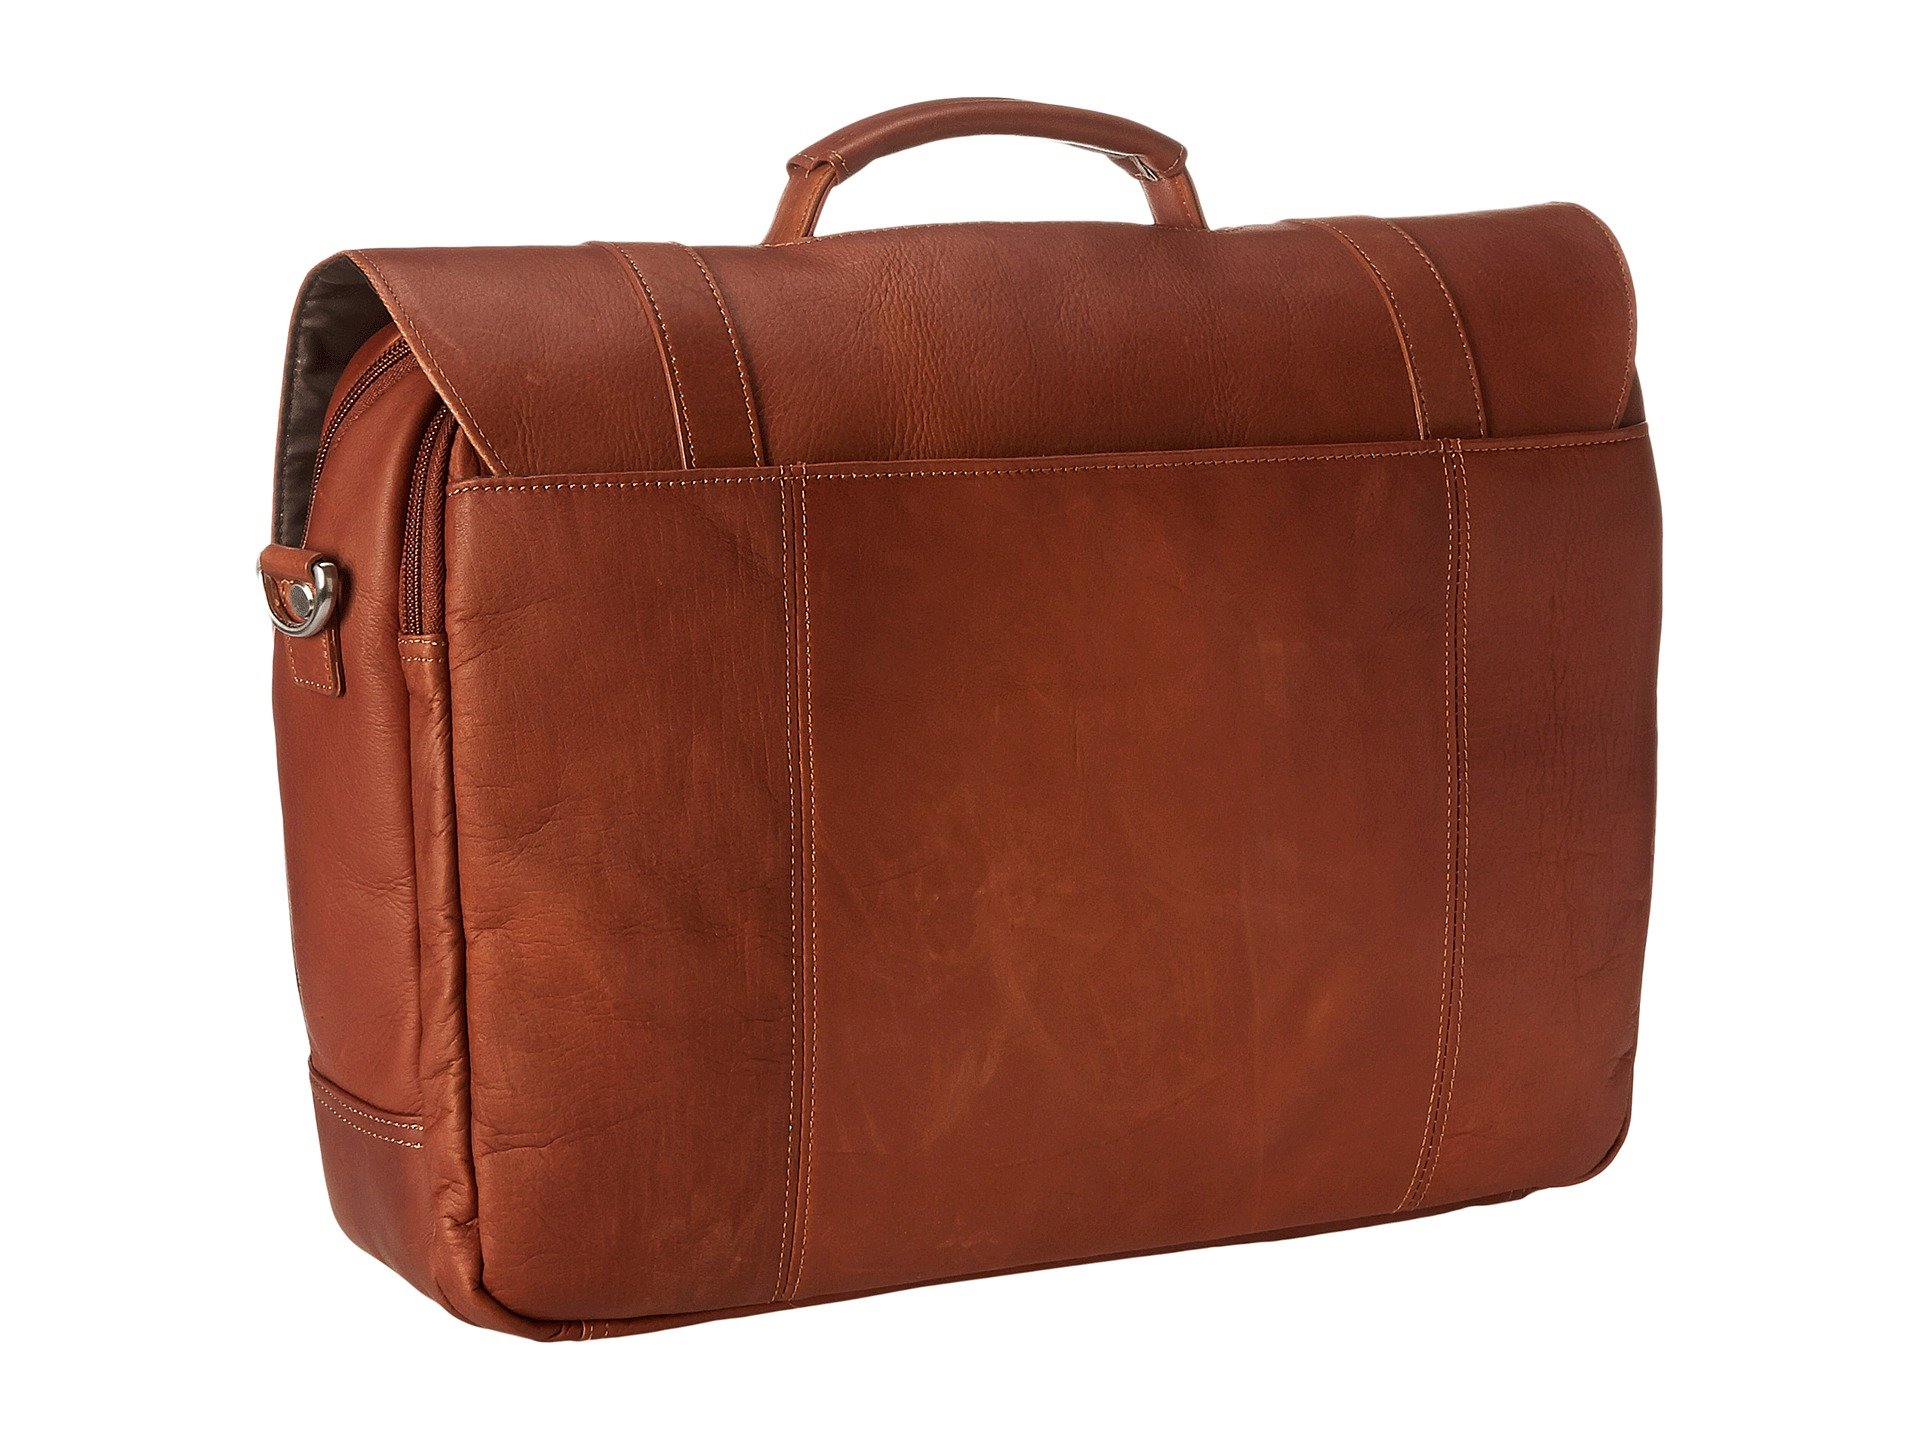 Case computer Colombian Kenneth Cole Leather Portfolio Cognac Reaction Flapover vYx0PqRx